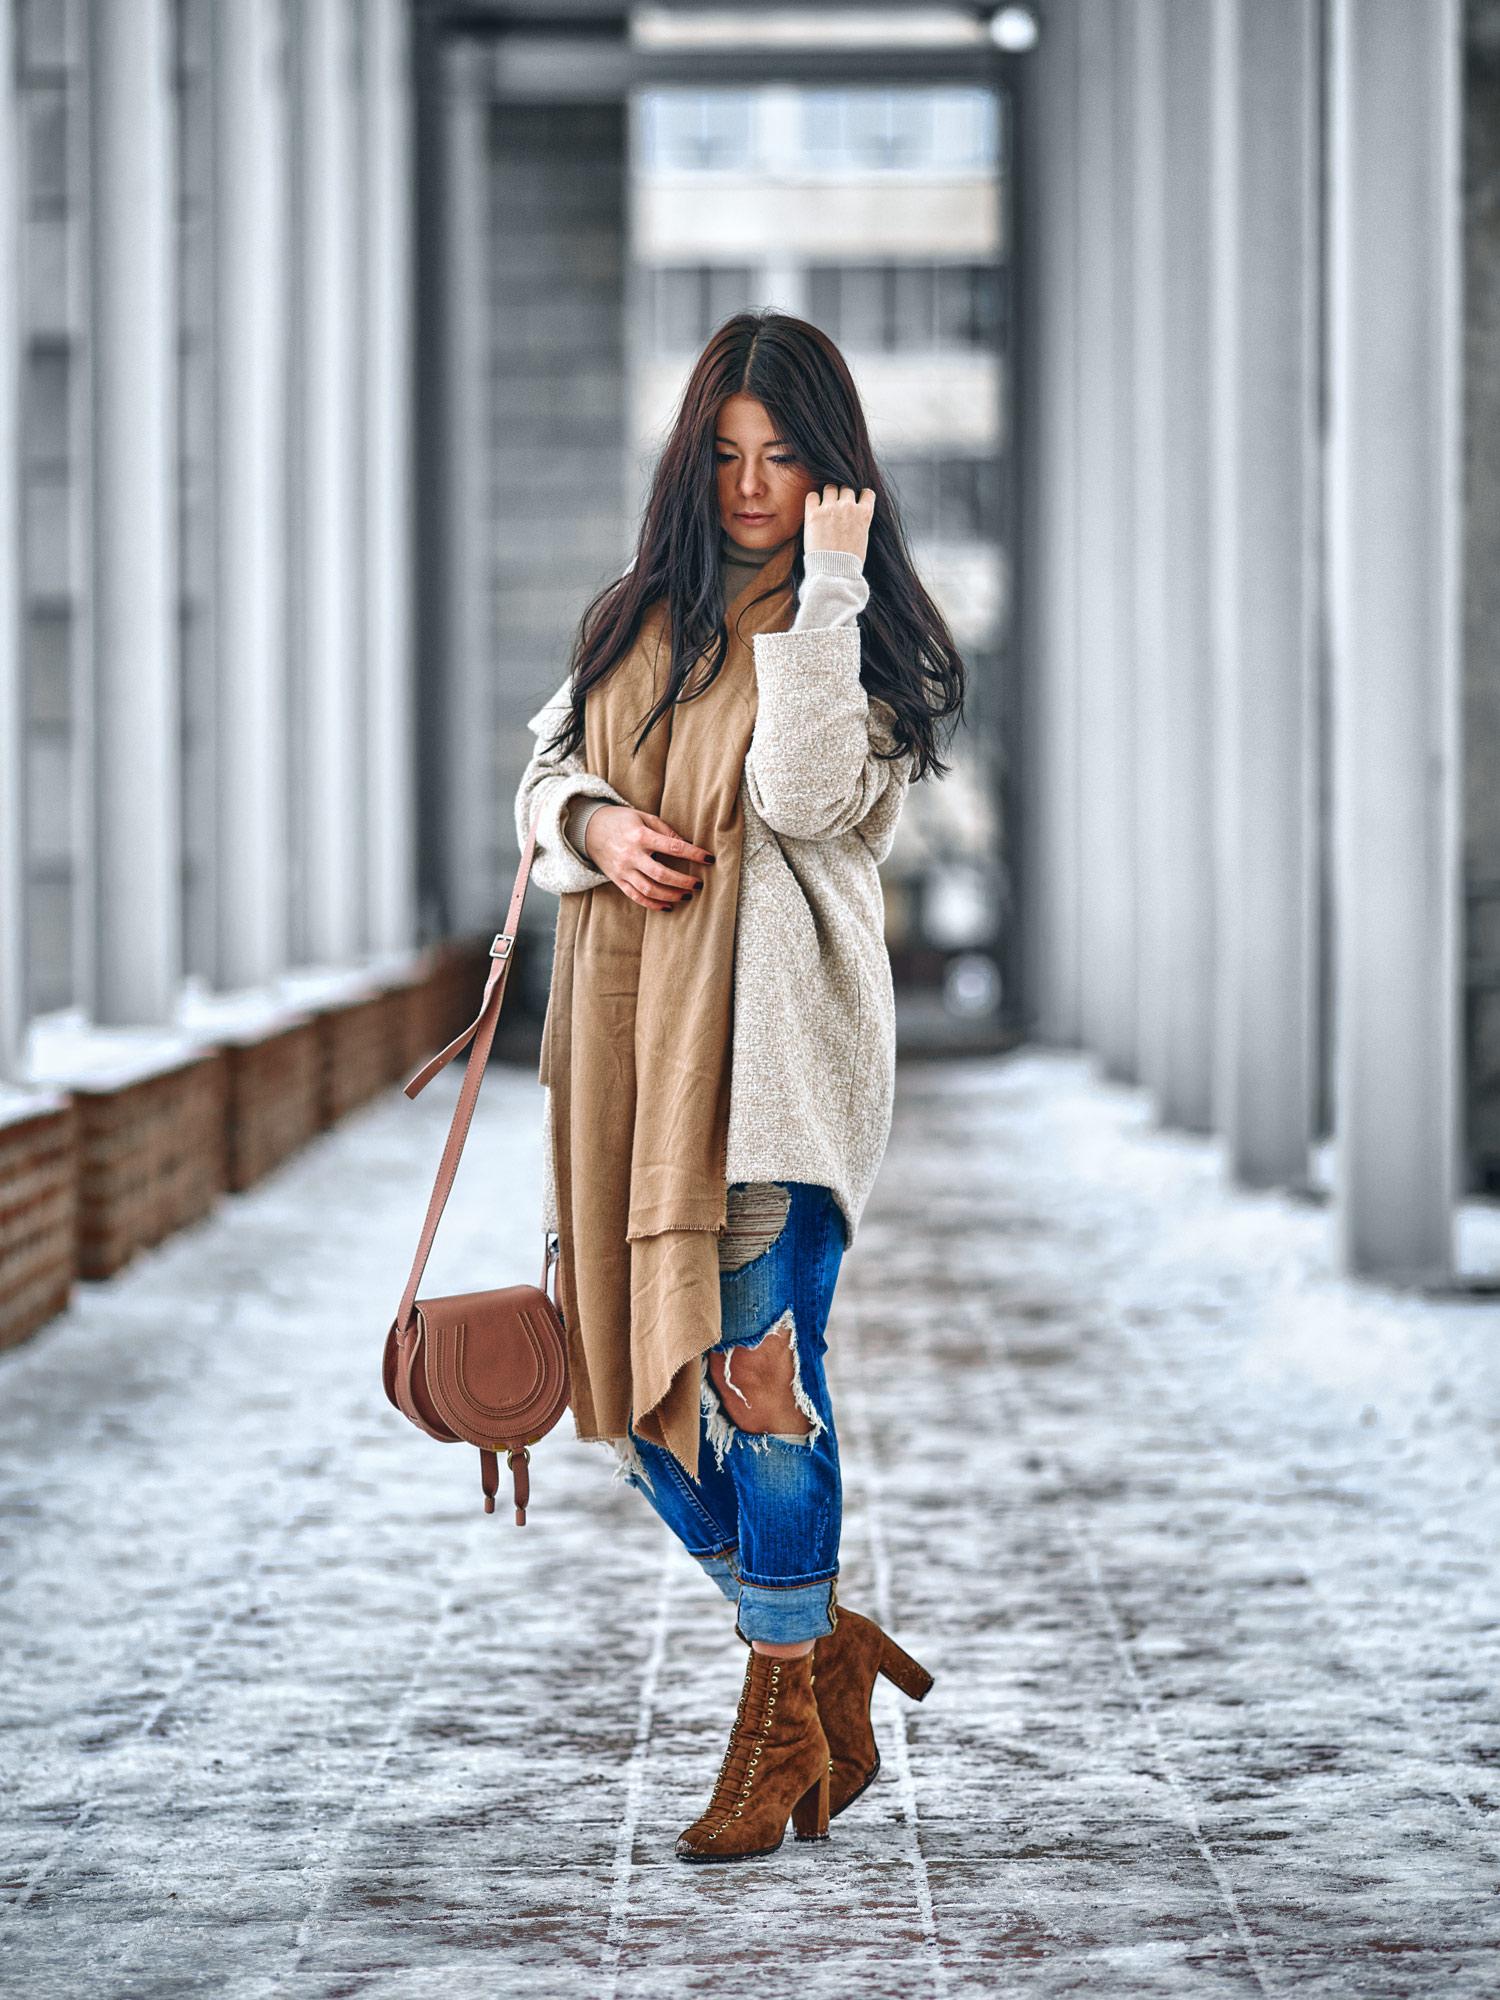 fashionambit-fashionblog-muenchen-modeblog-deutschland-blogger-modeblogger-fashionblogger-bloggerdeutschland-lifestyleblog-munich-style-blog-trend-schuhe-sale